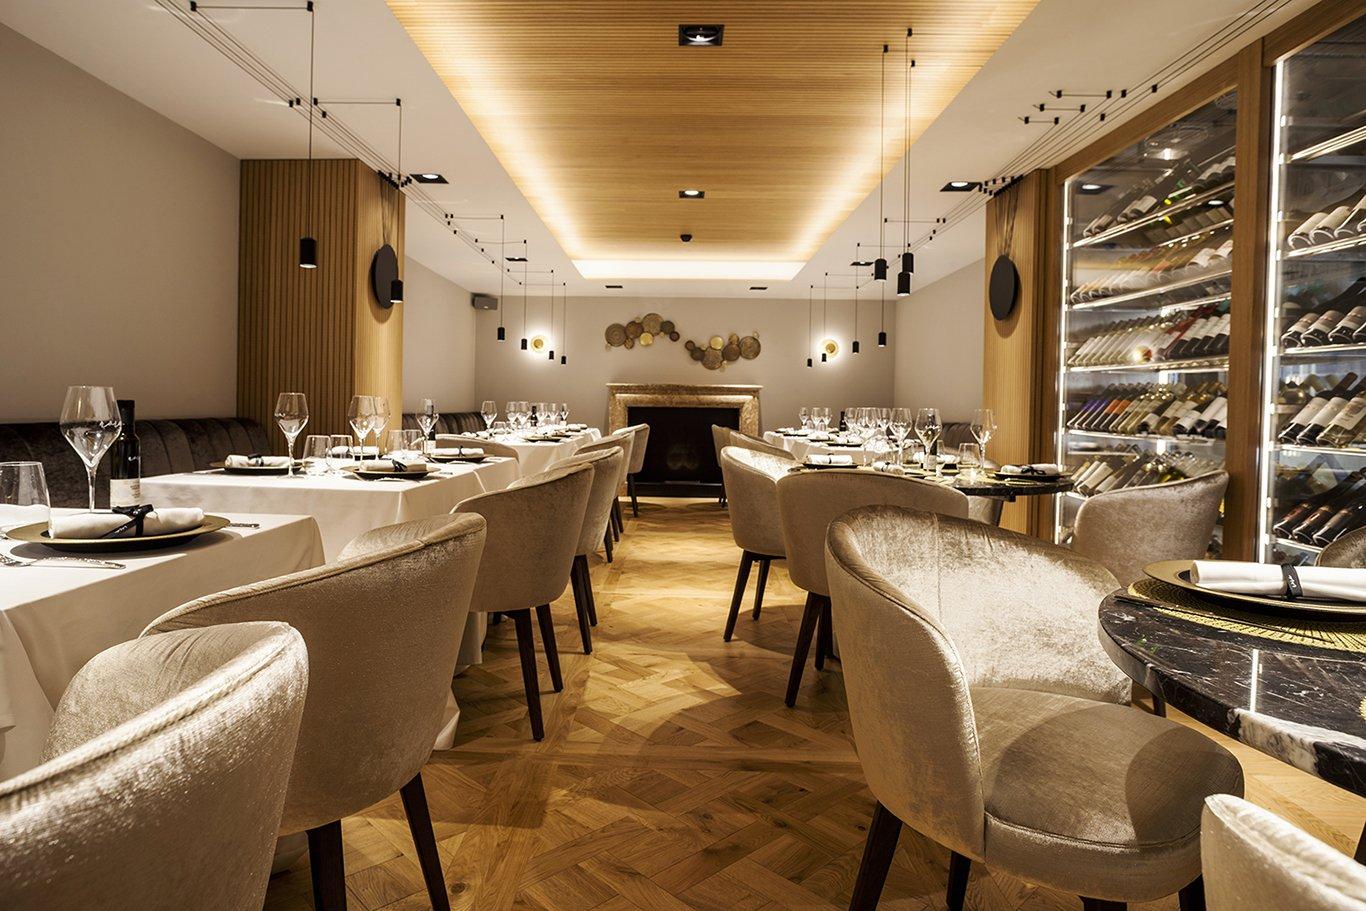 diseño de interiores para restaurantes